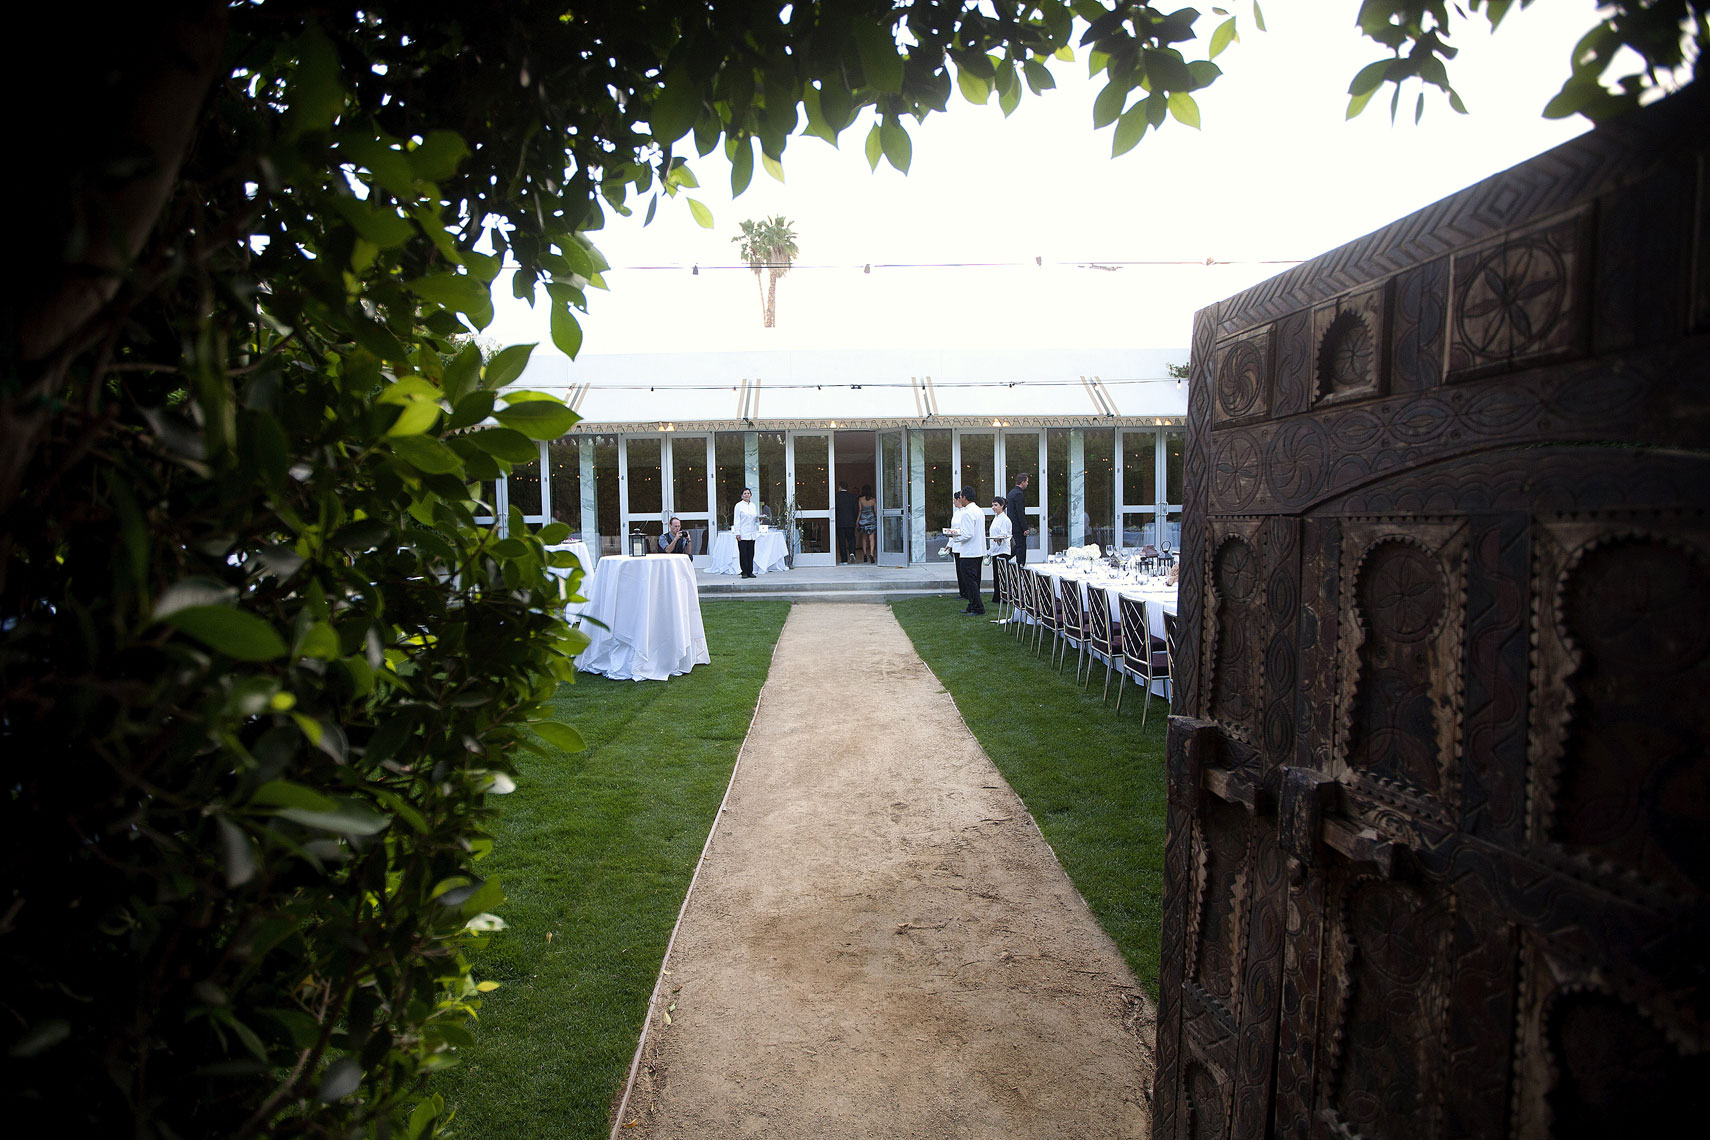 parker palm springs wedding venue photos by nicole caldwell075